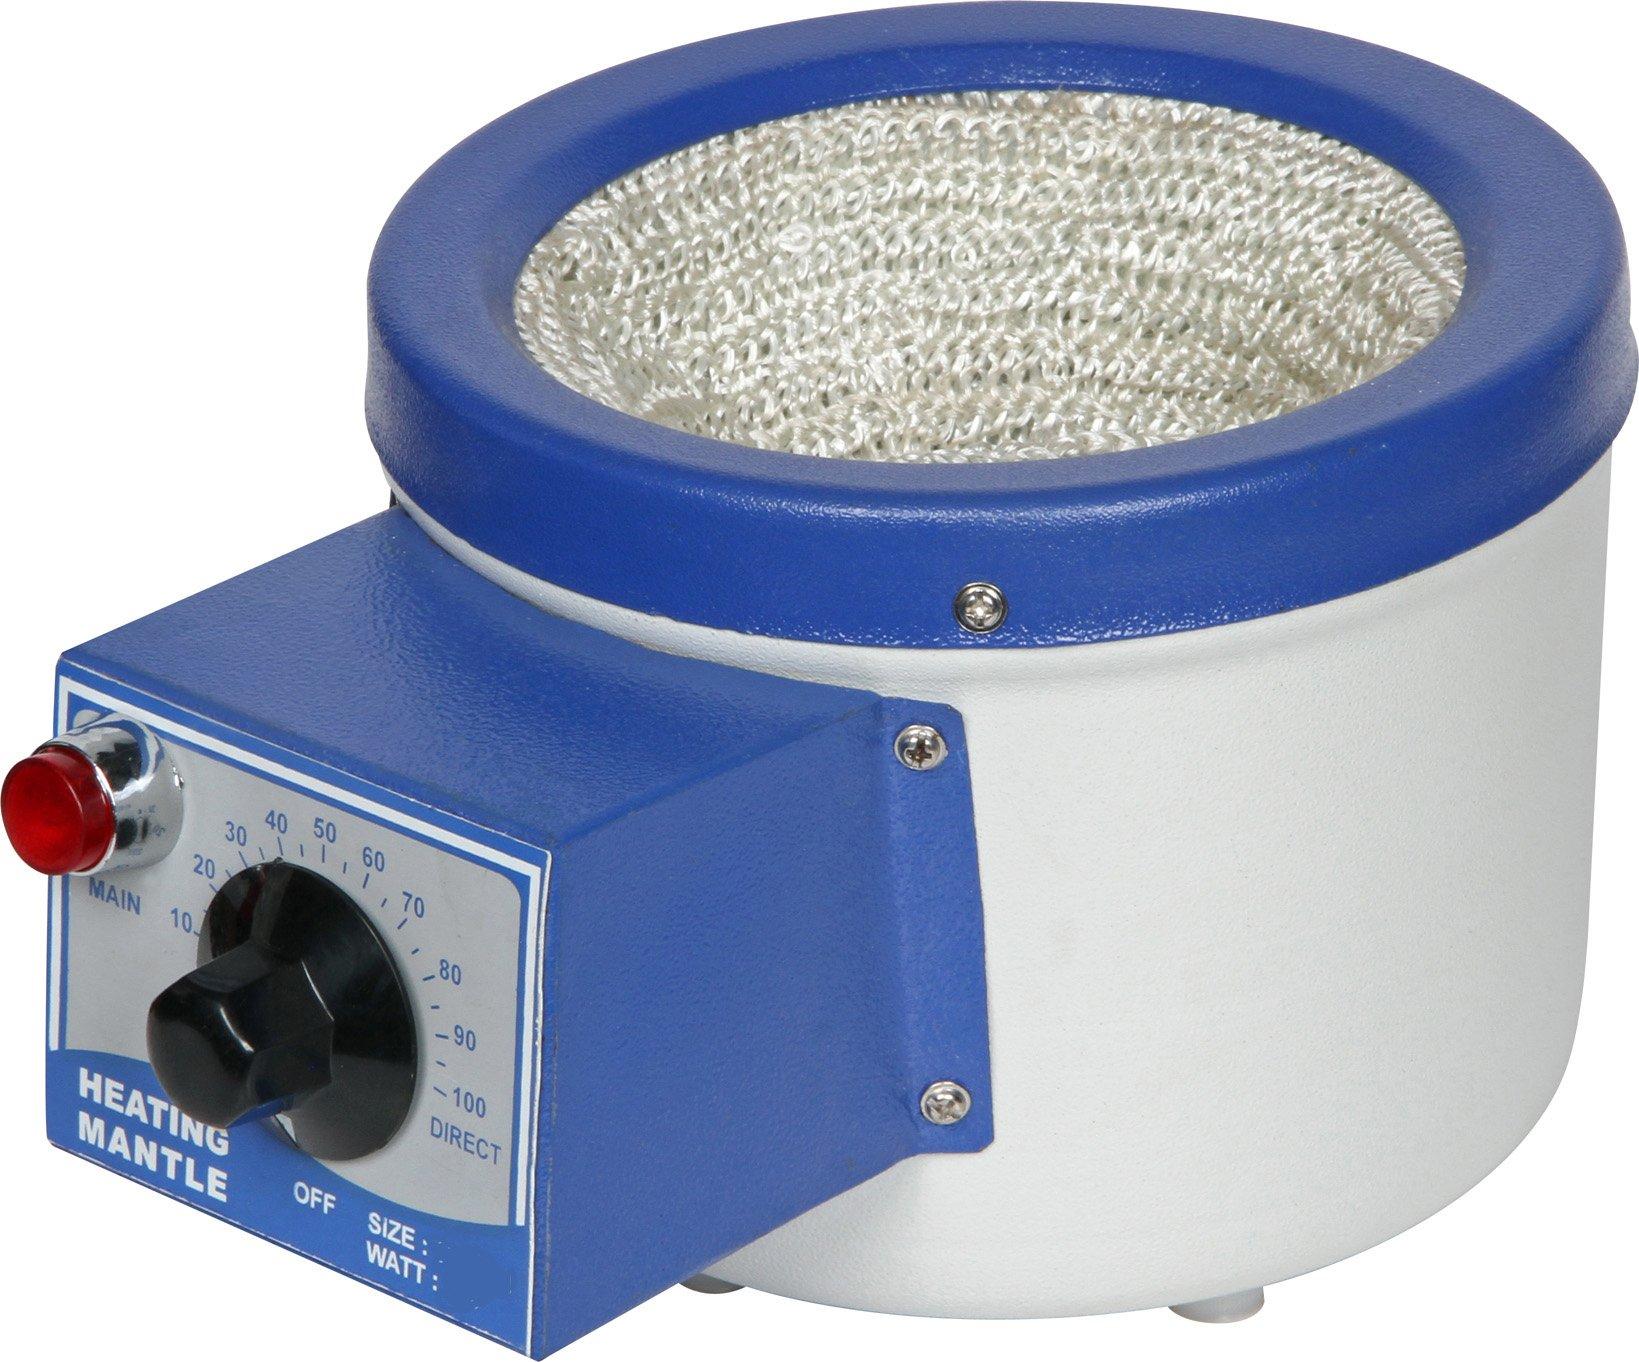 BEXCO Heating Mantle Capacity: 500 ml, Voltage: 110 V